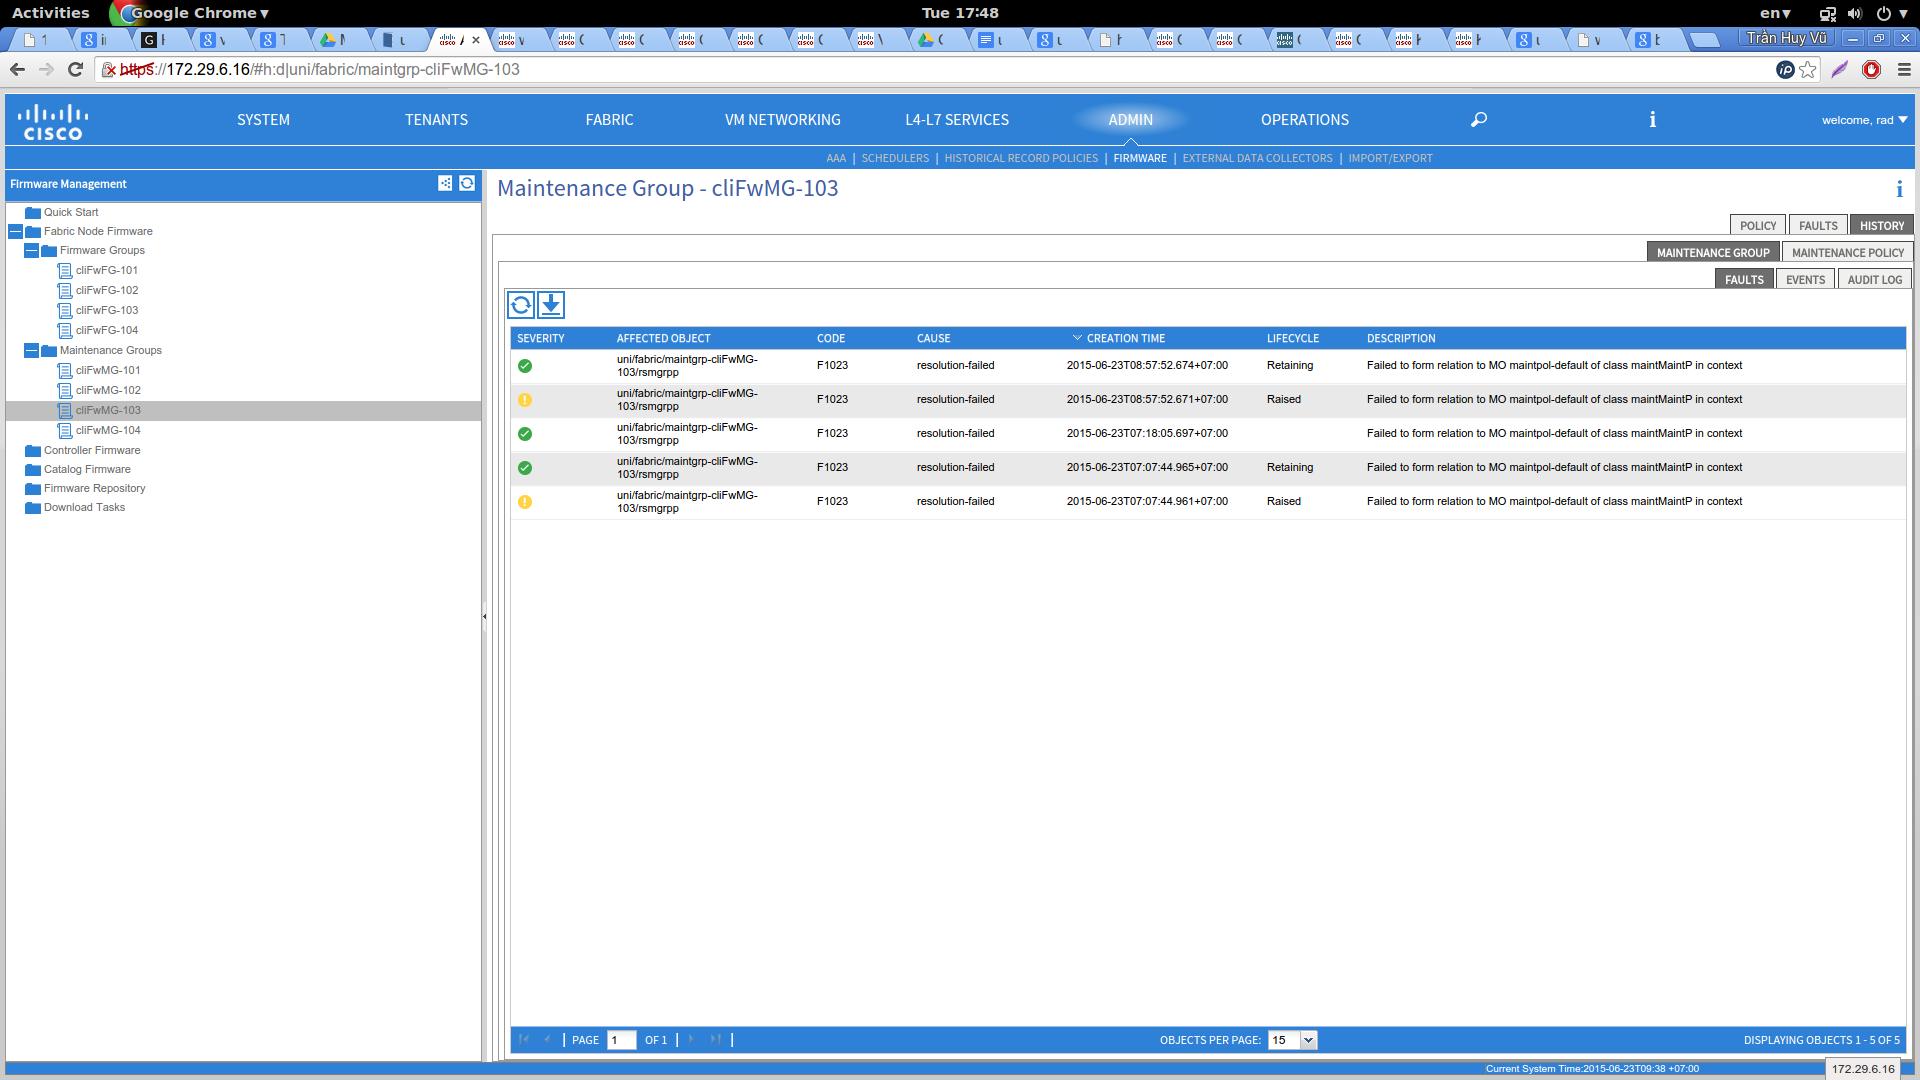 Updating cisco sg200-26 firmware | oemden.